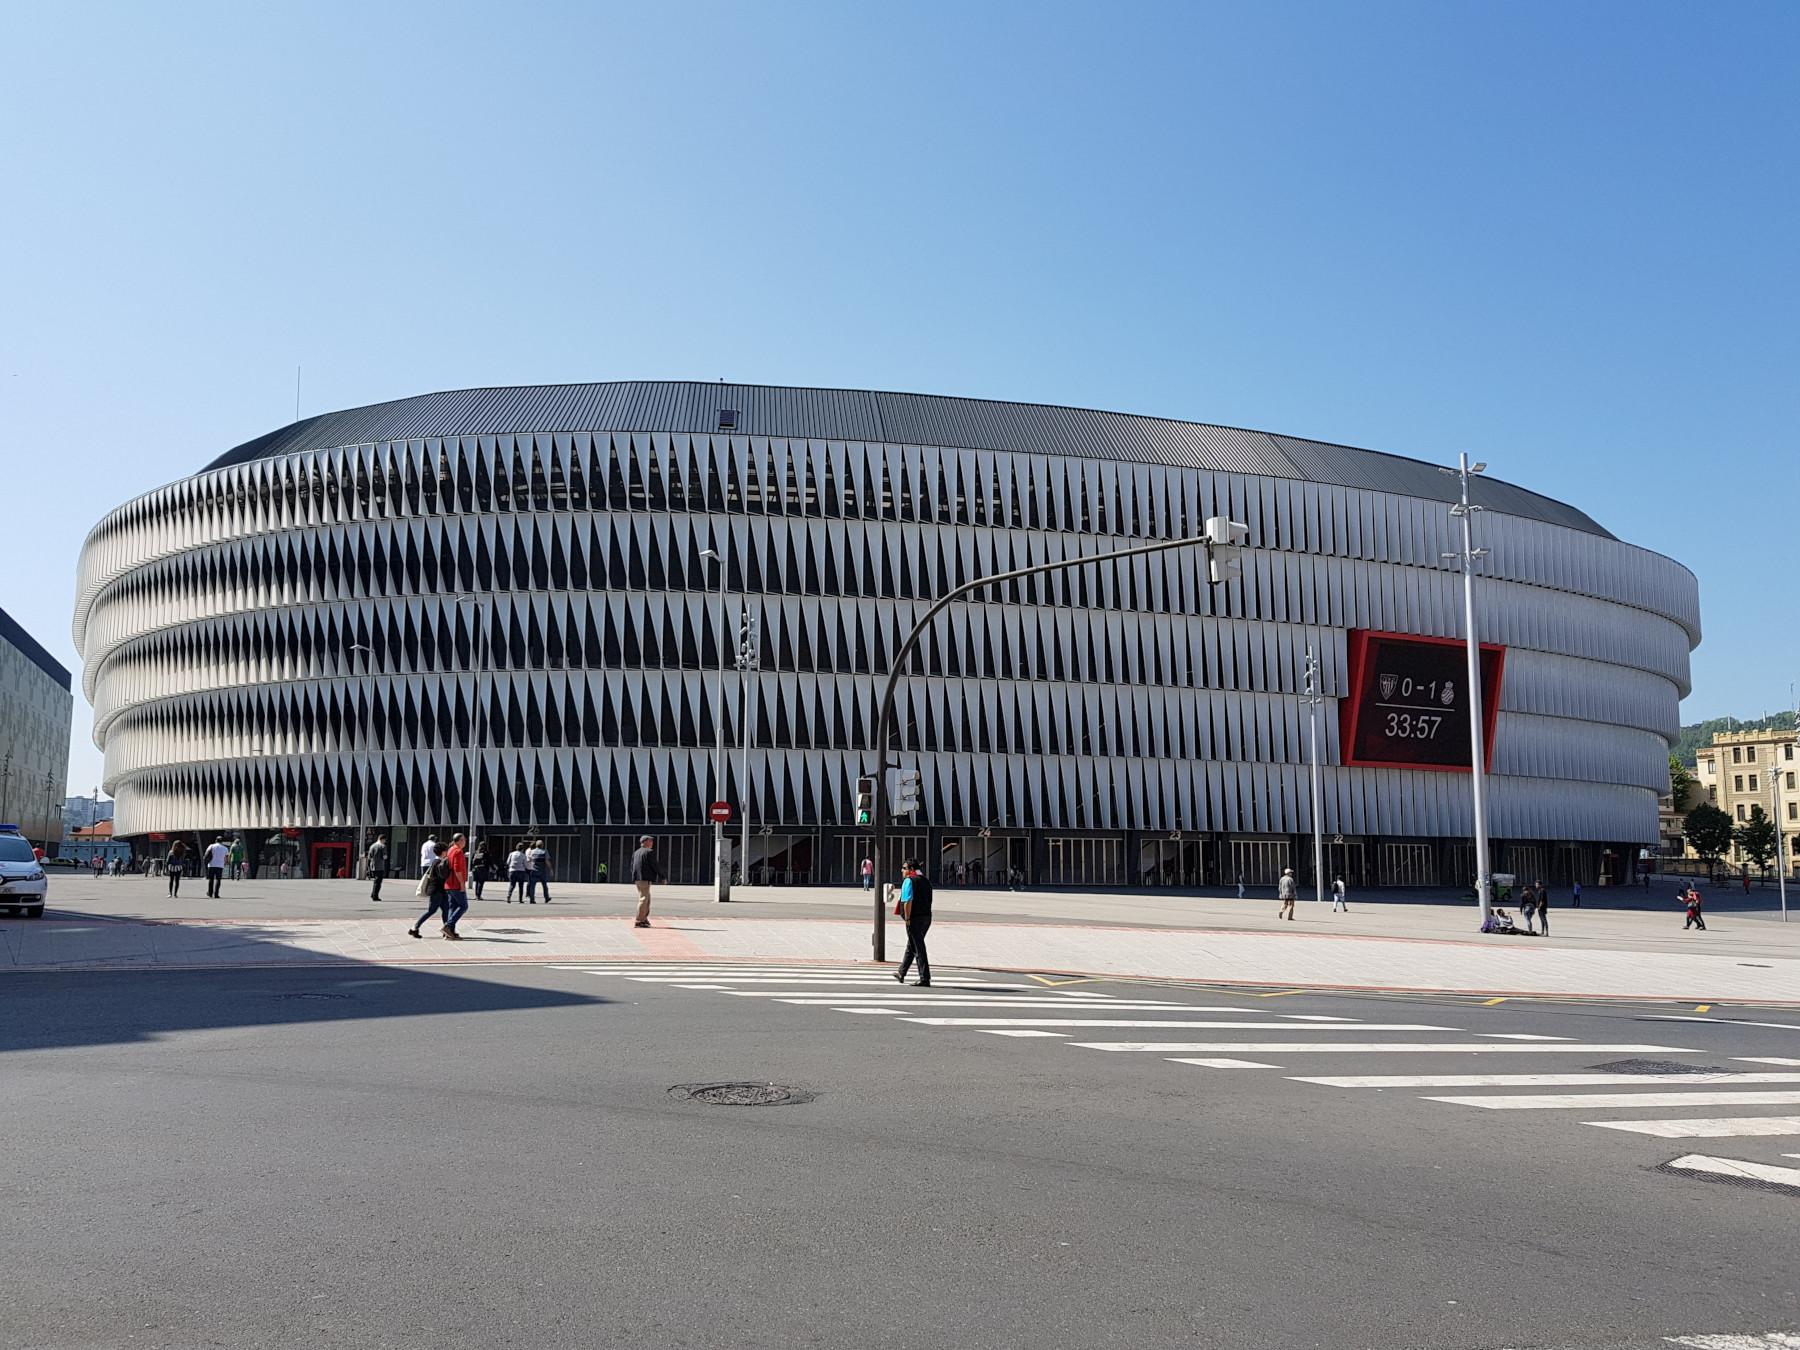 cтадион Сан-Мамес в Бильбао